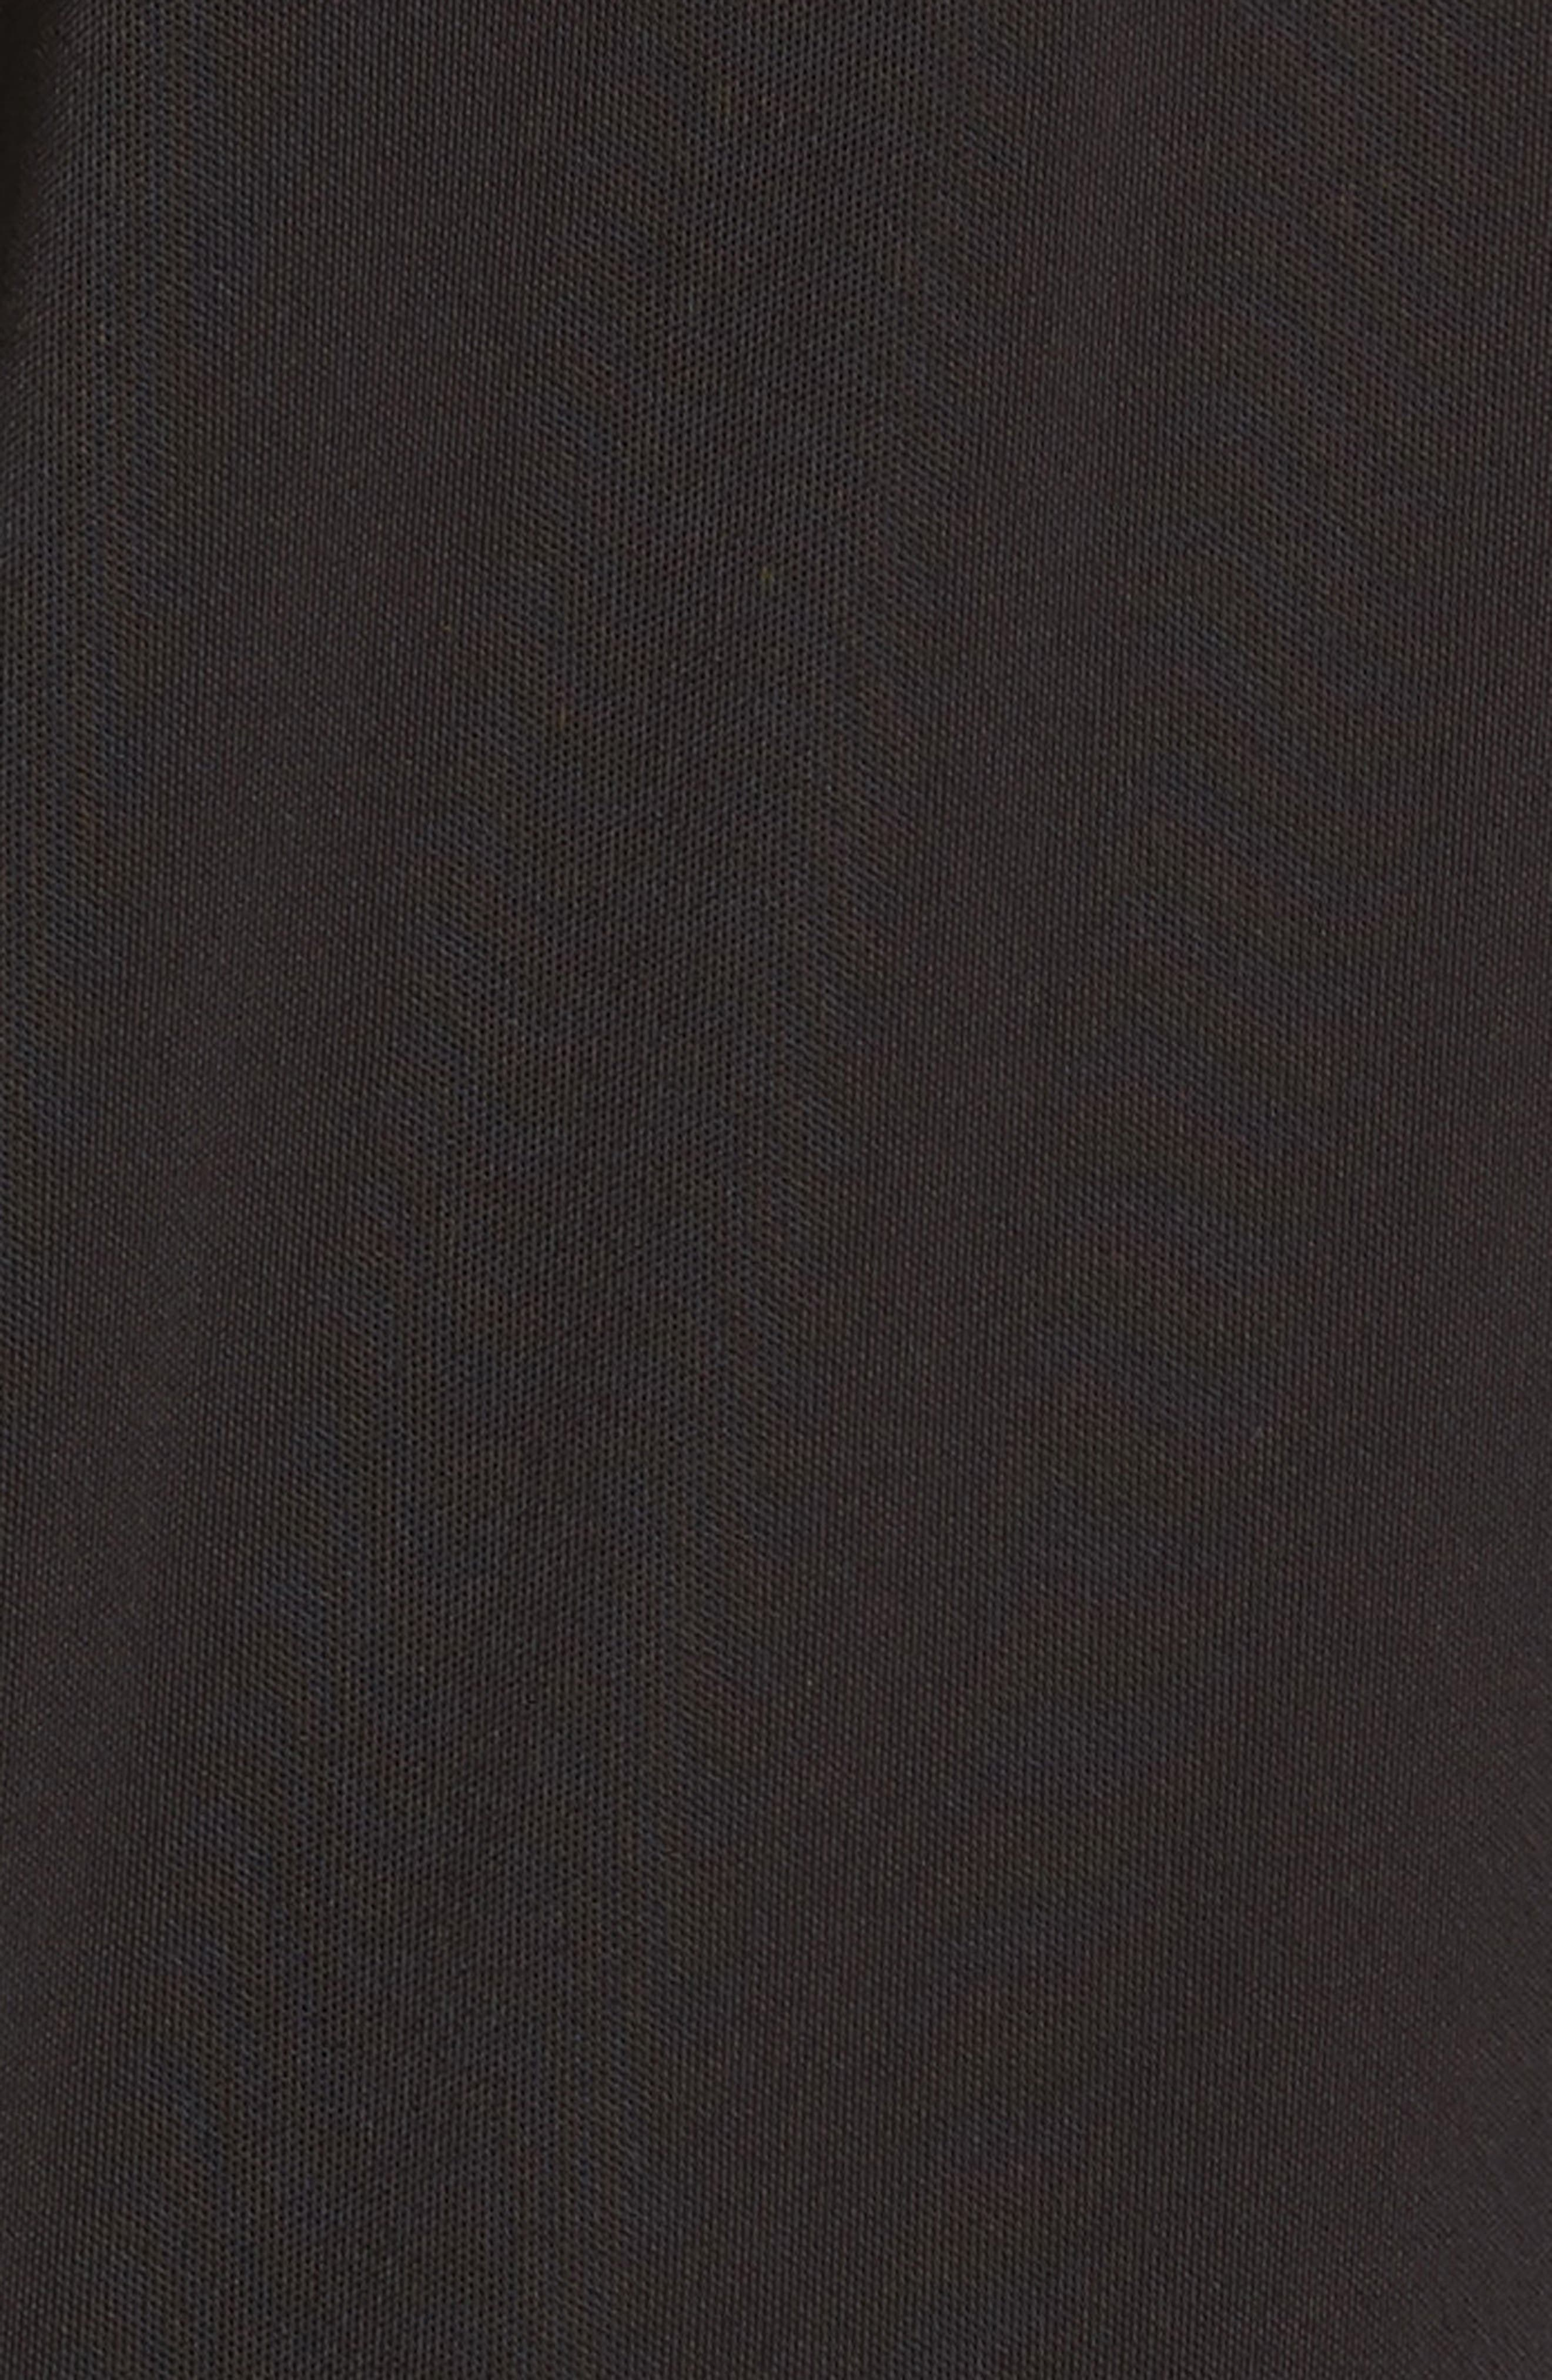 Merino Trim Turtleneck Sweater,                             Alternate thumbnail 5, color,                             001